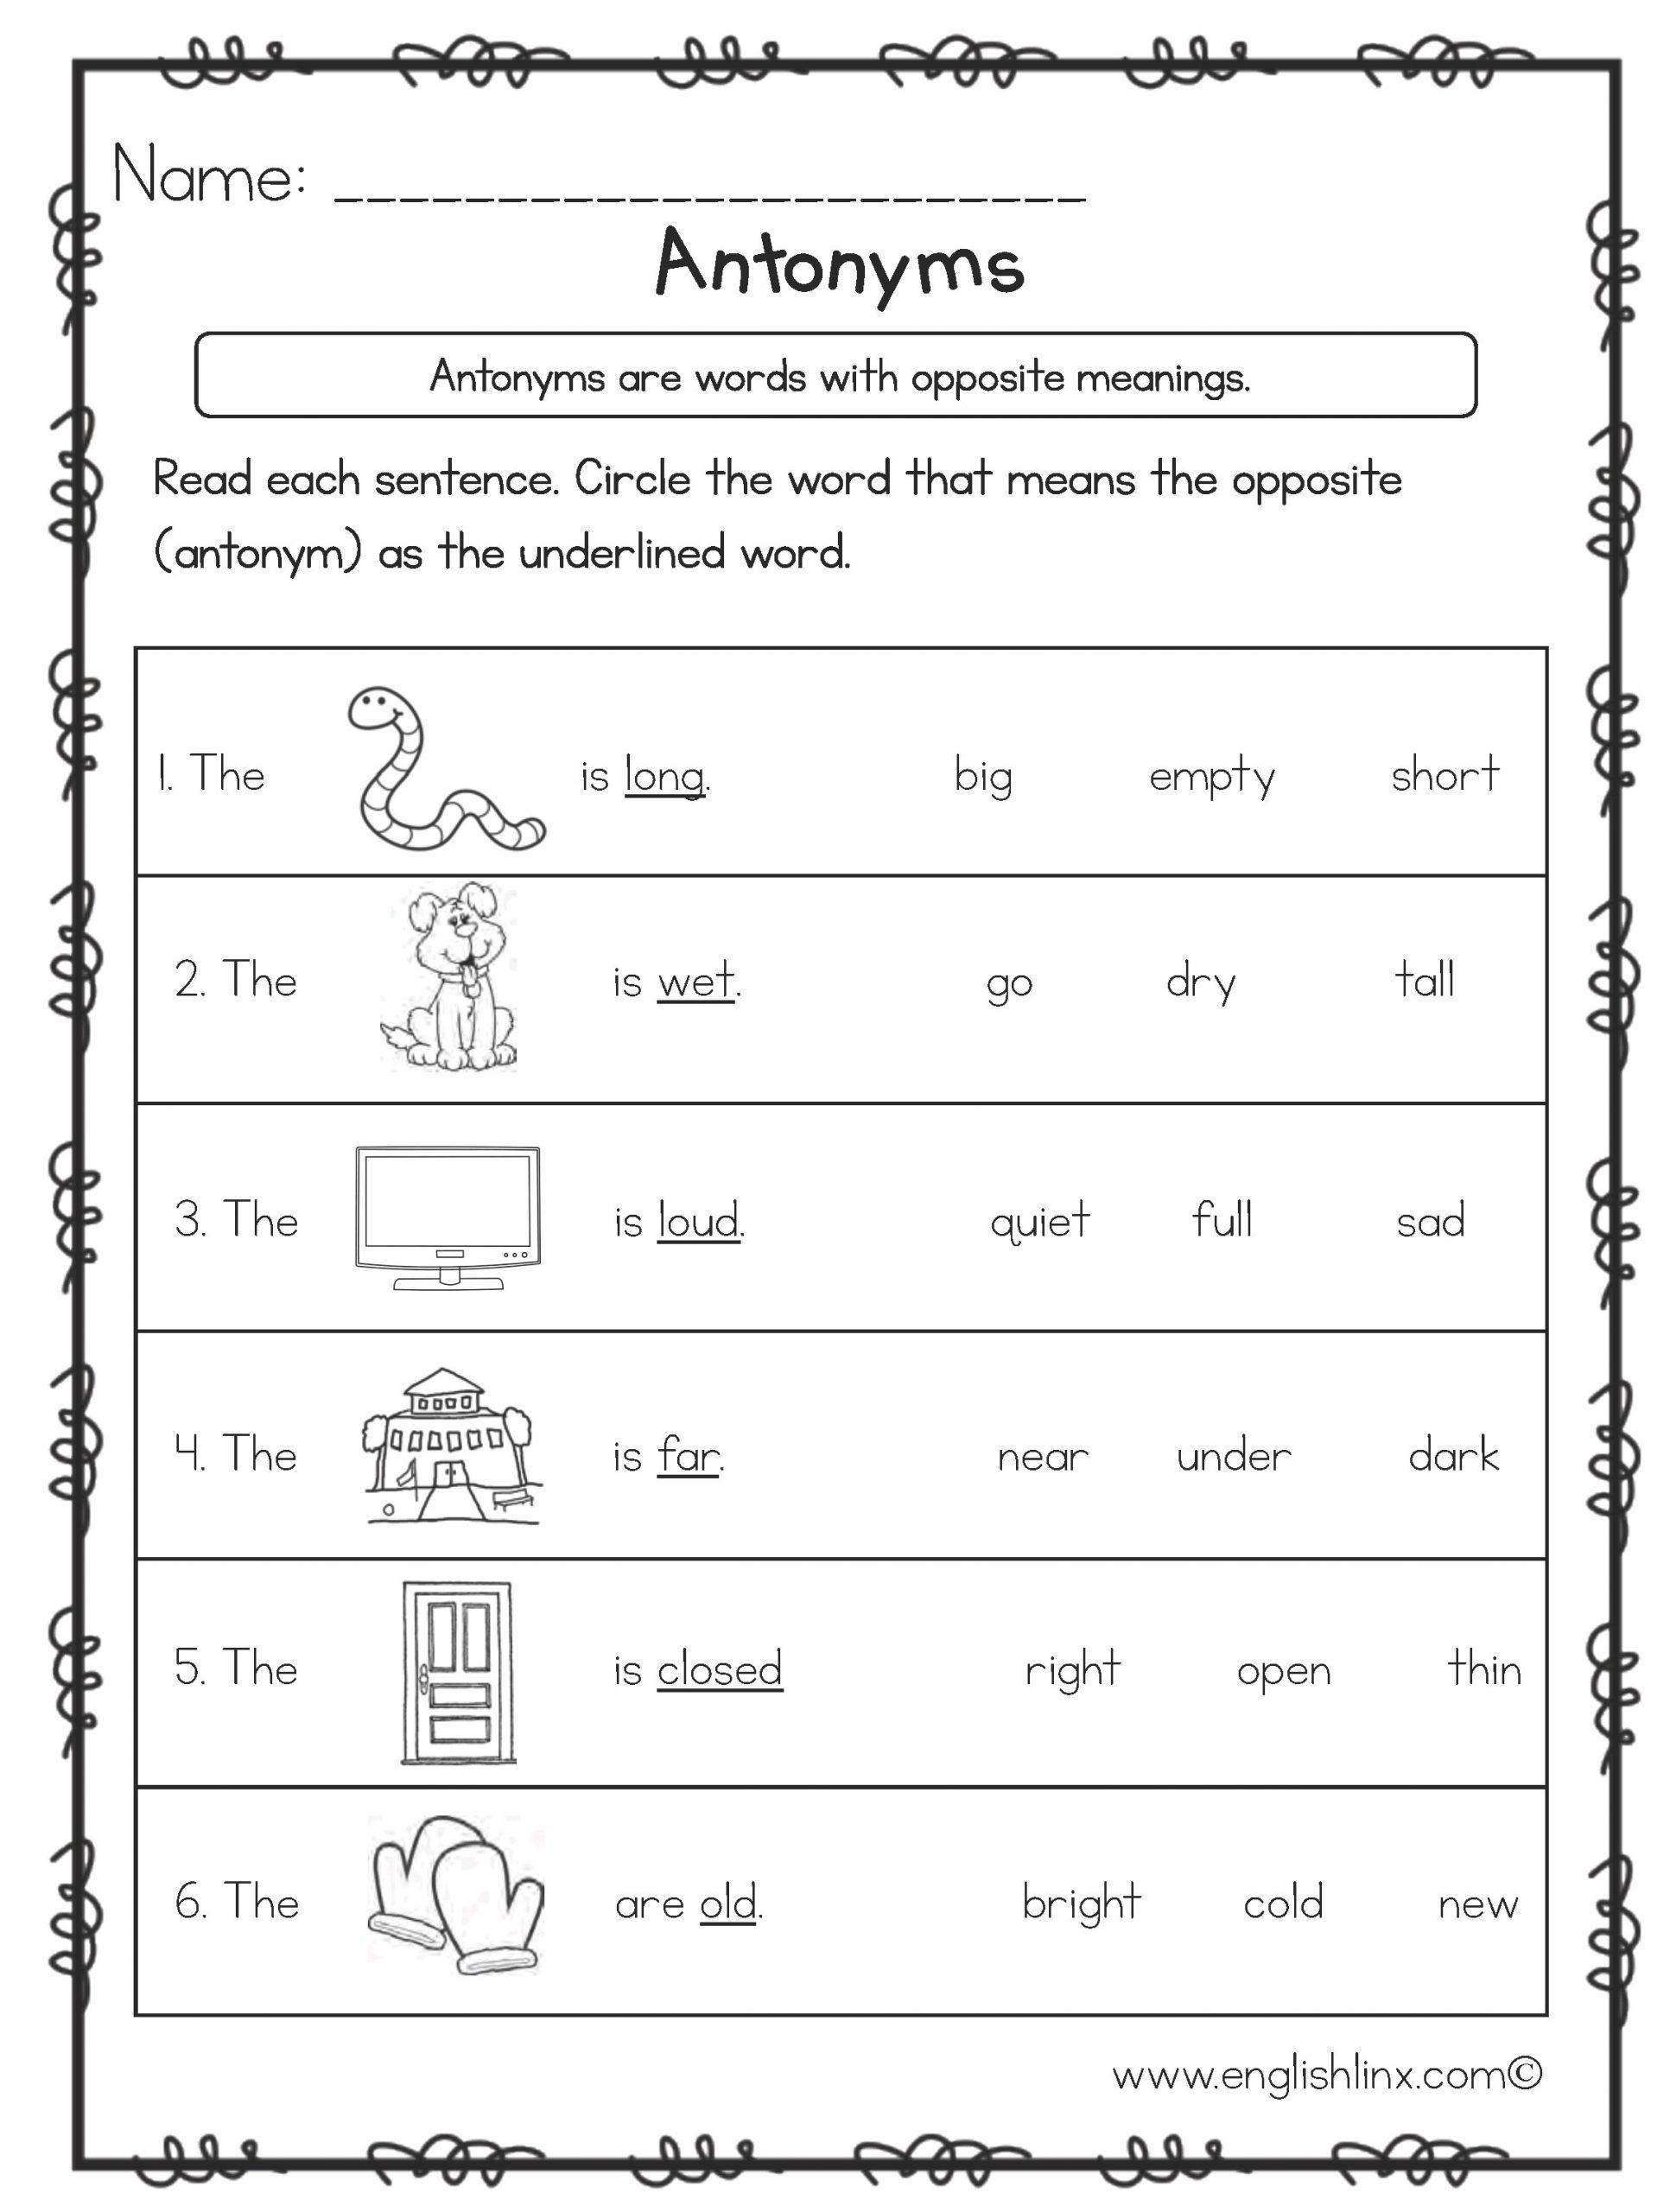 Antonyms Worksheets For Kindergarten Synonym Worksheet Antonyms Worksheet Opposites Worksheet